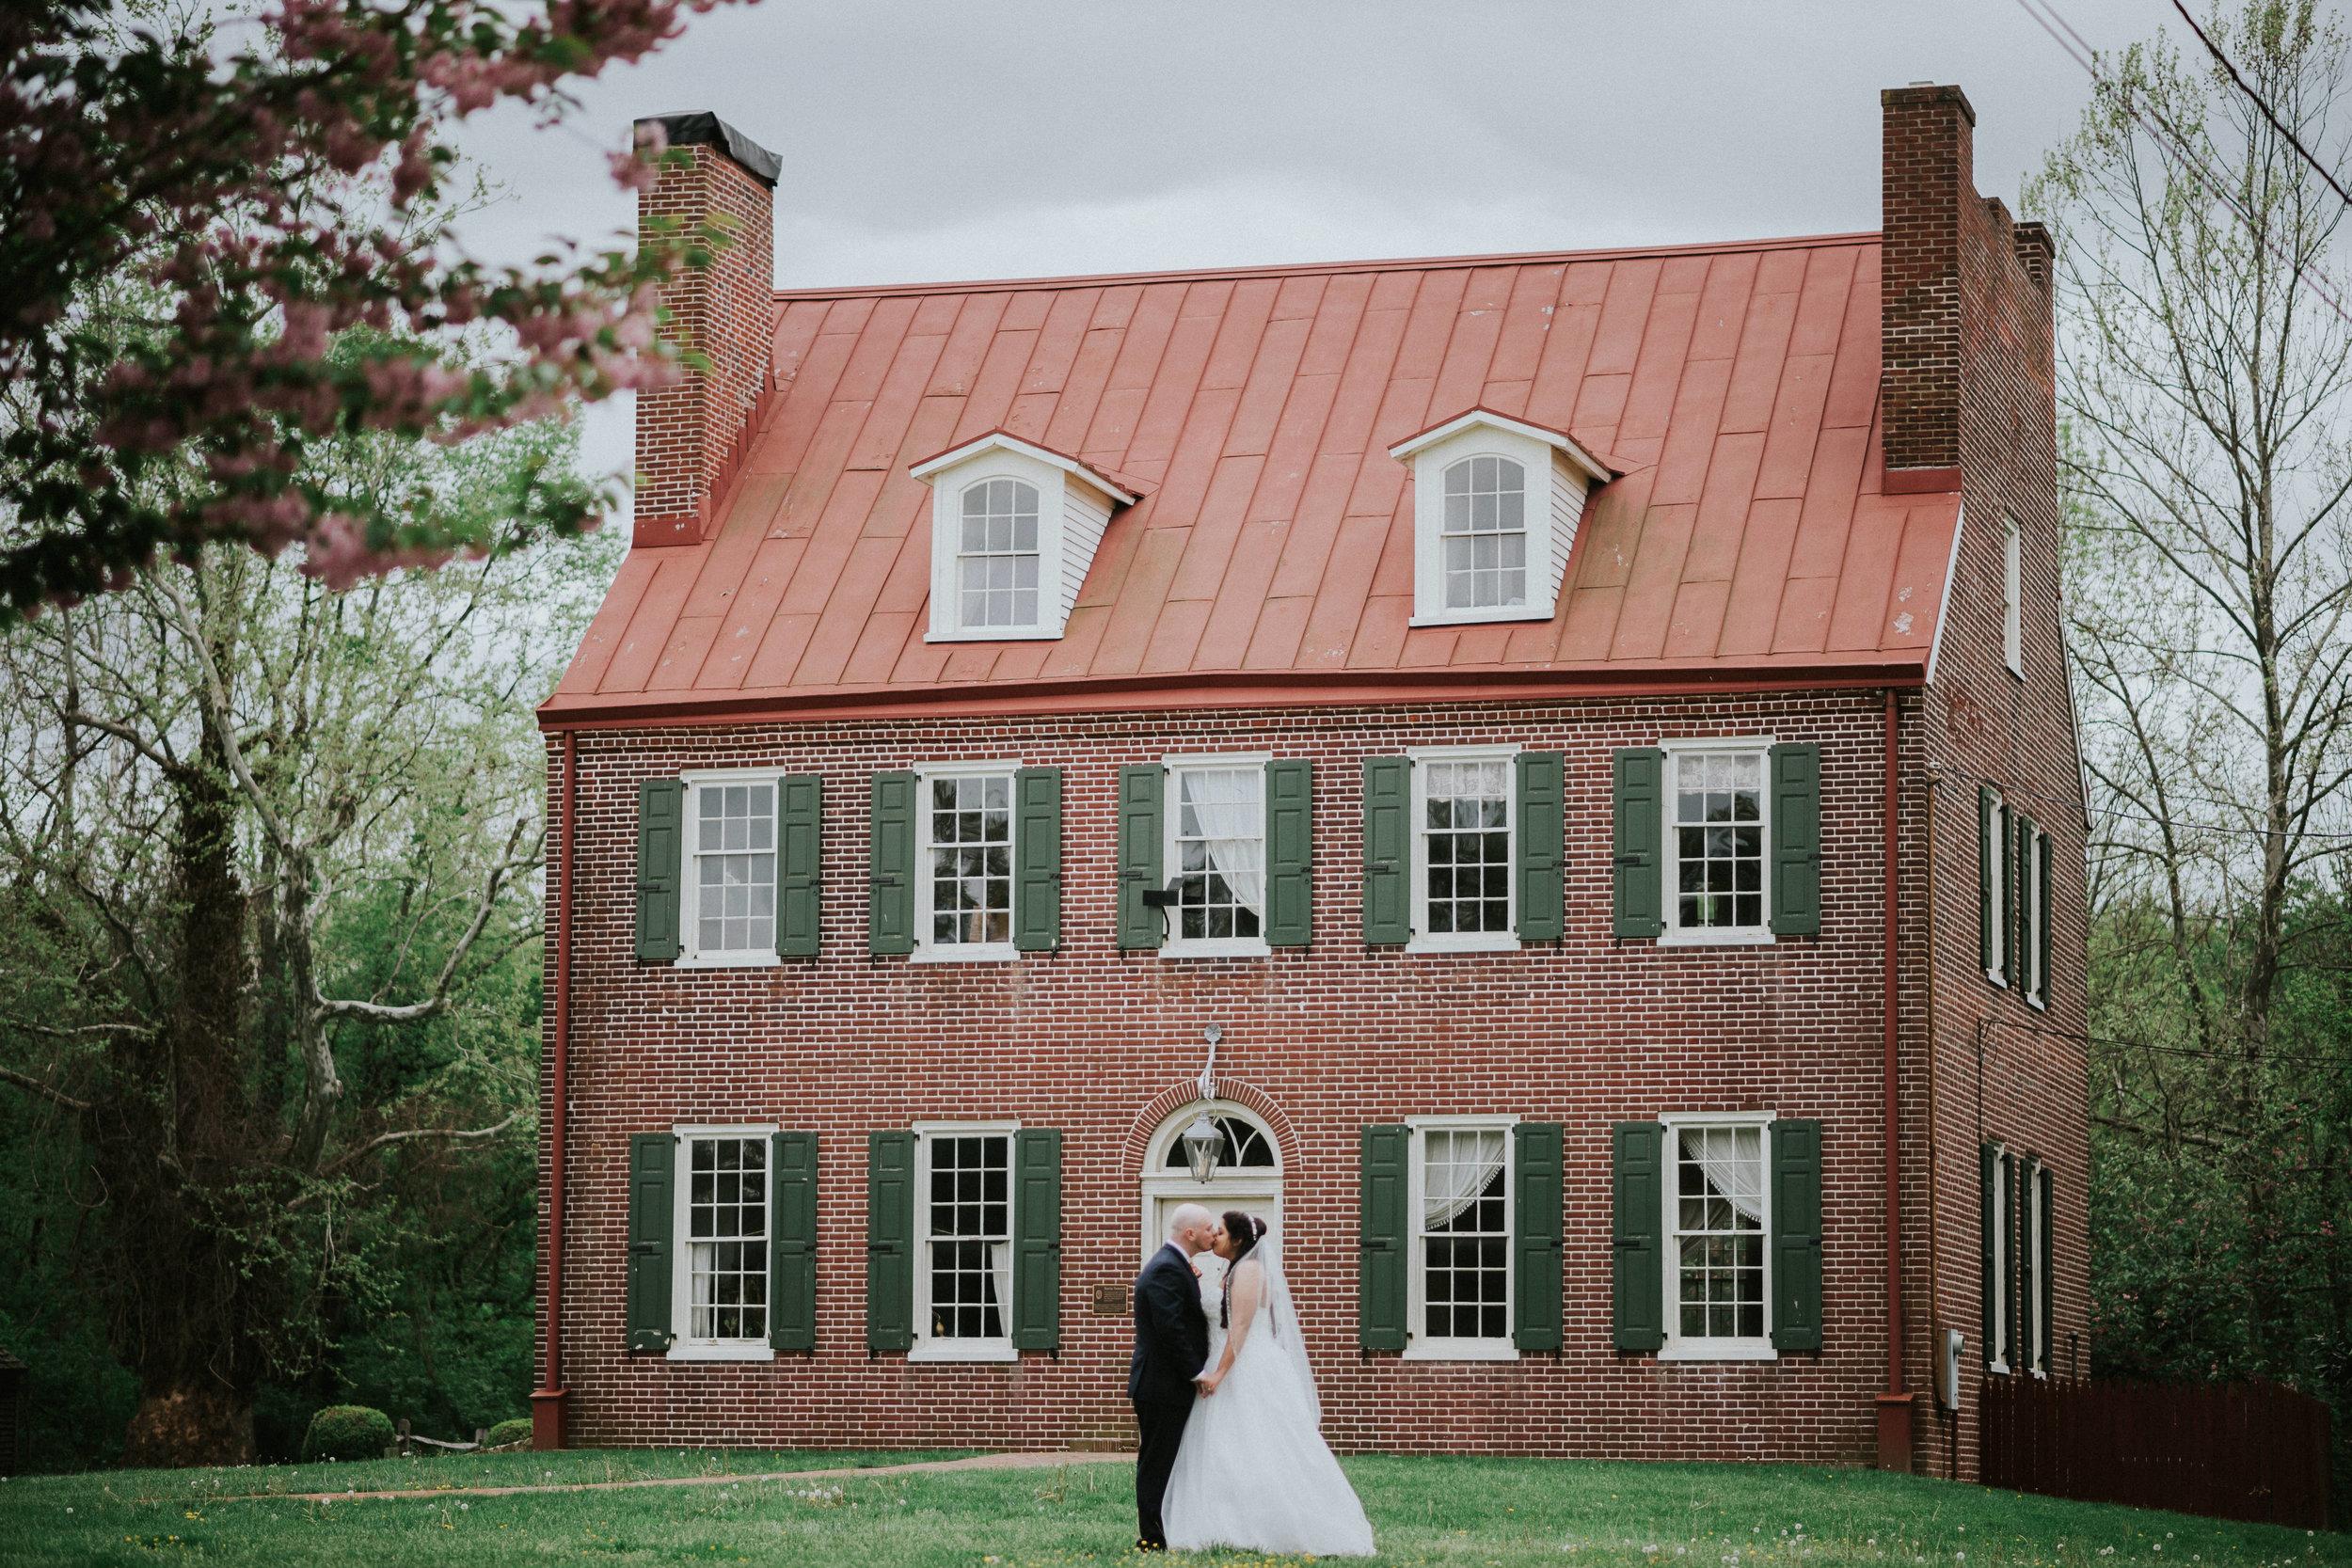 Barclay-Farmstead-Wedding-Rosa-and-Mike-441.jpg